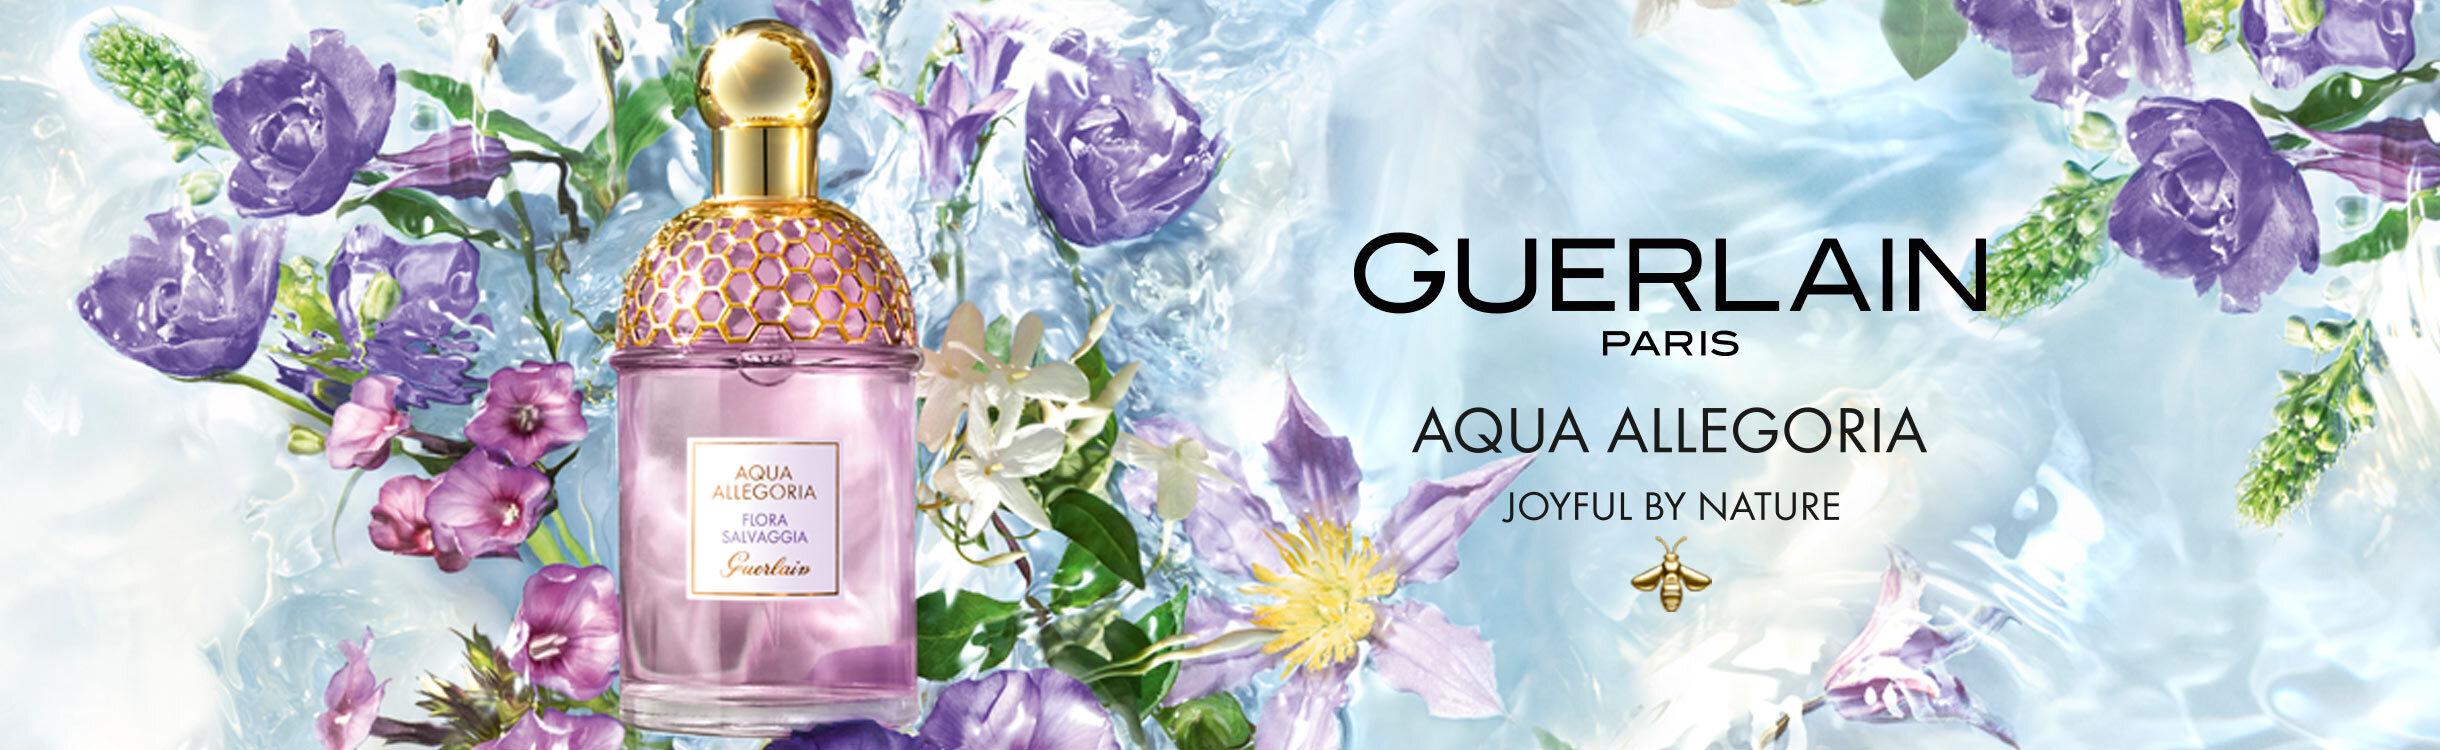 Perfumes e Perfumaria Guerlain